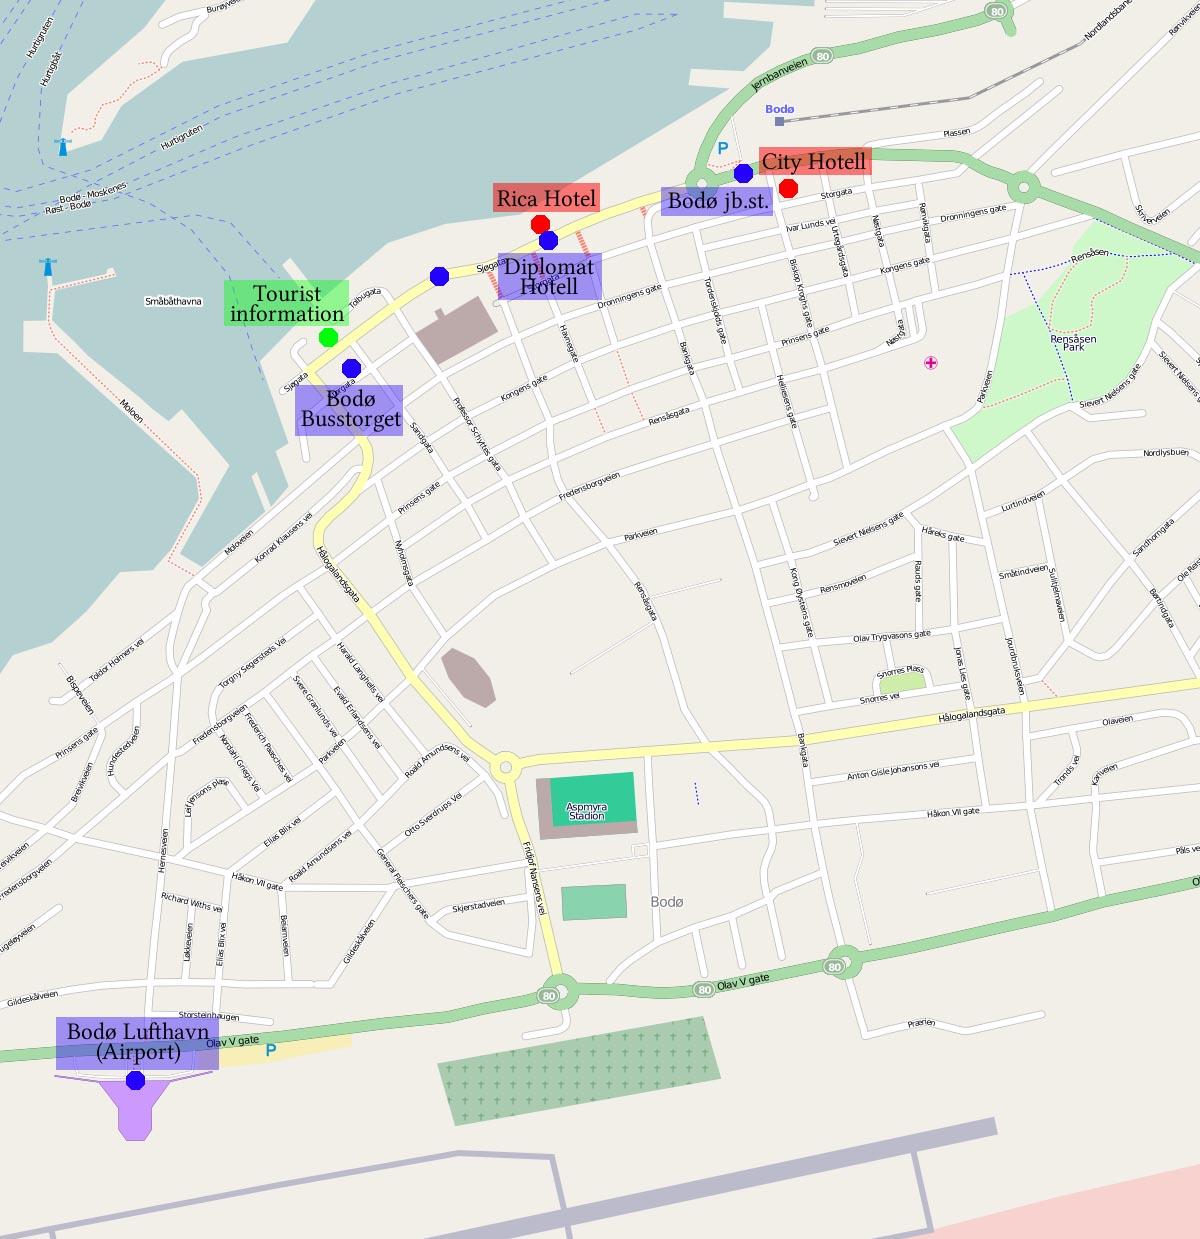 kart bodø sentrum Hvordan finne veien til Birkeli kart bodø sentrum